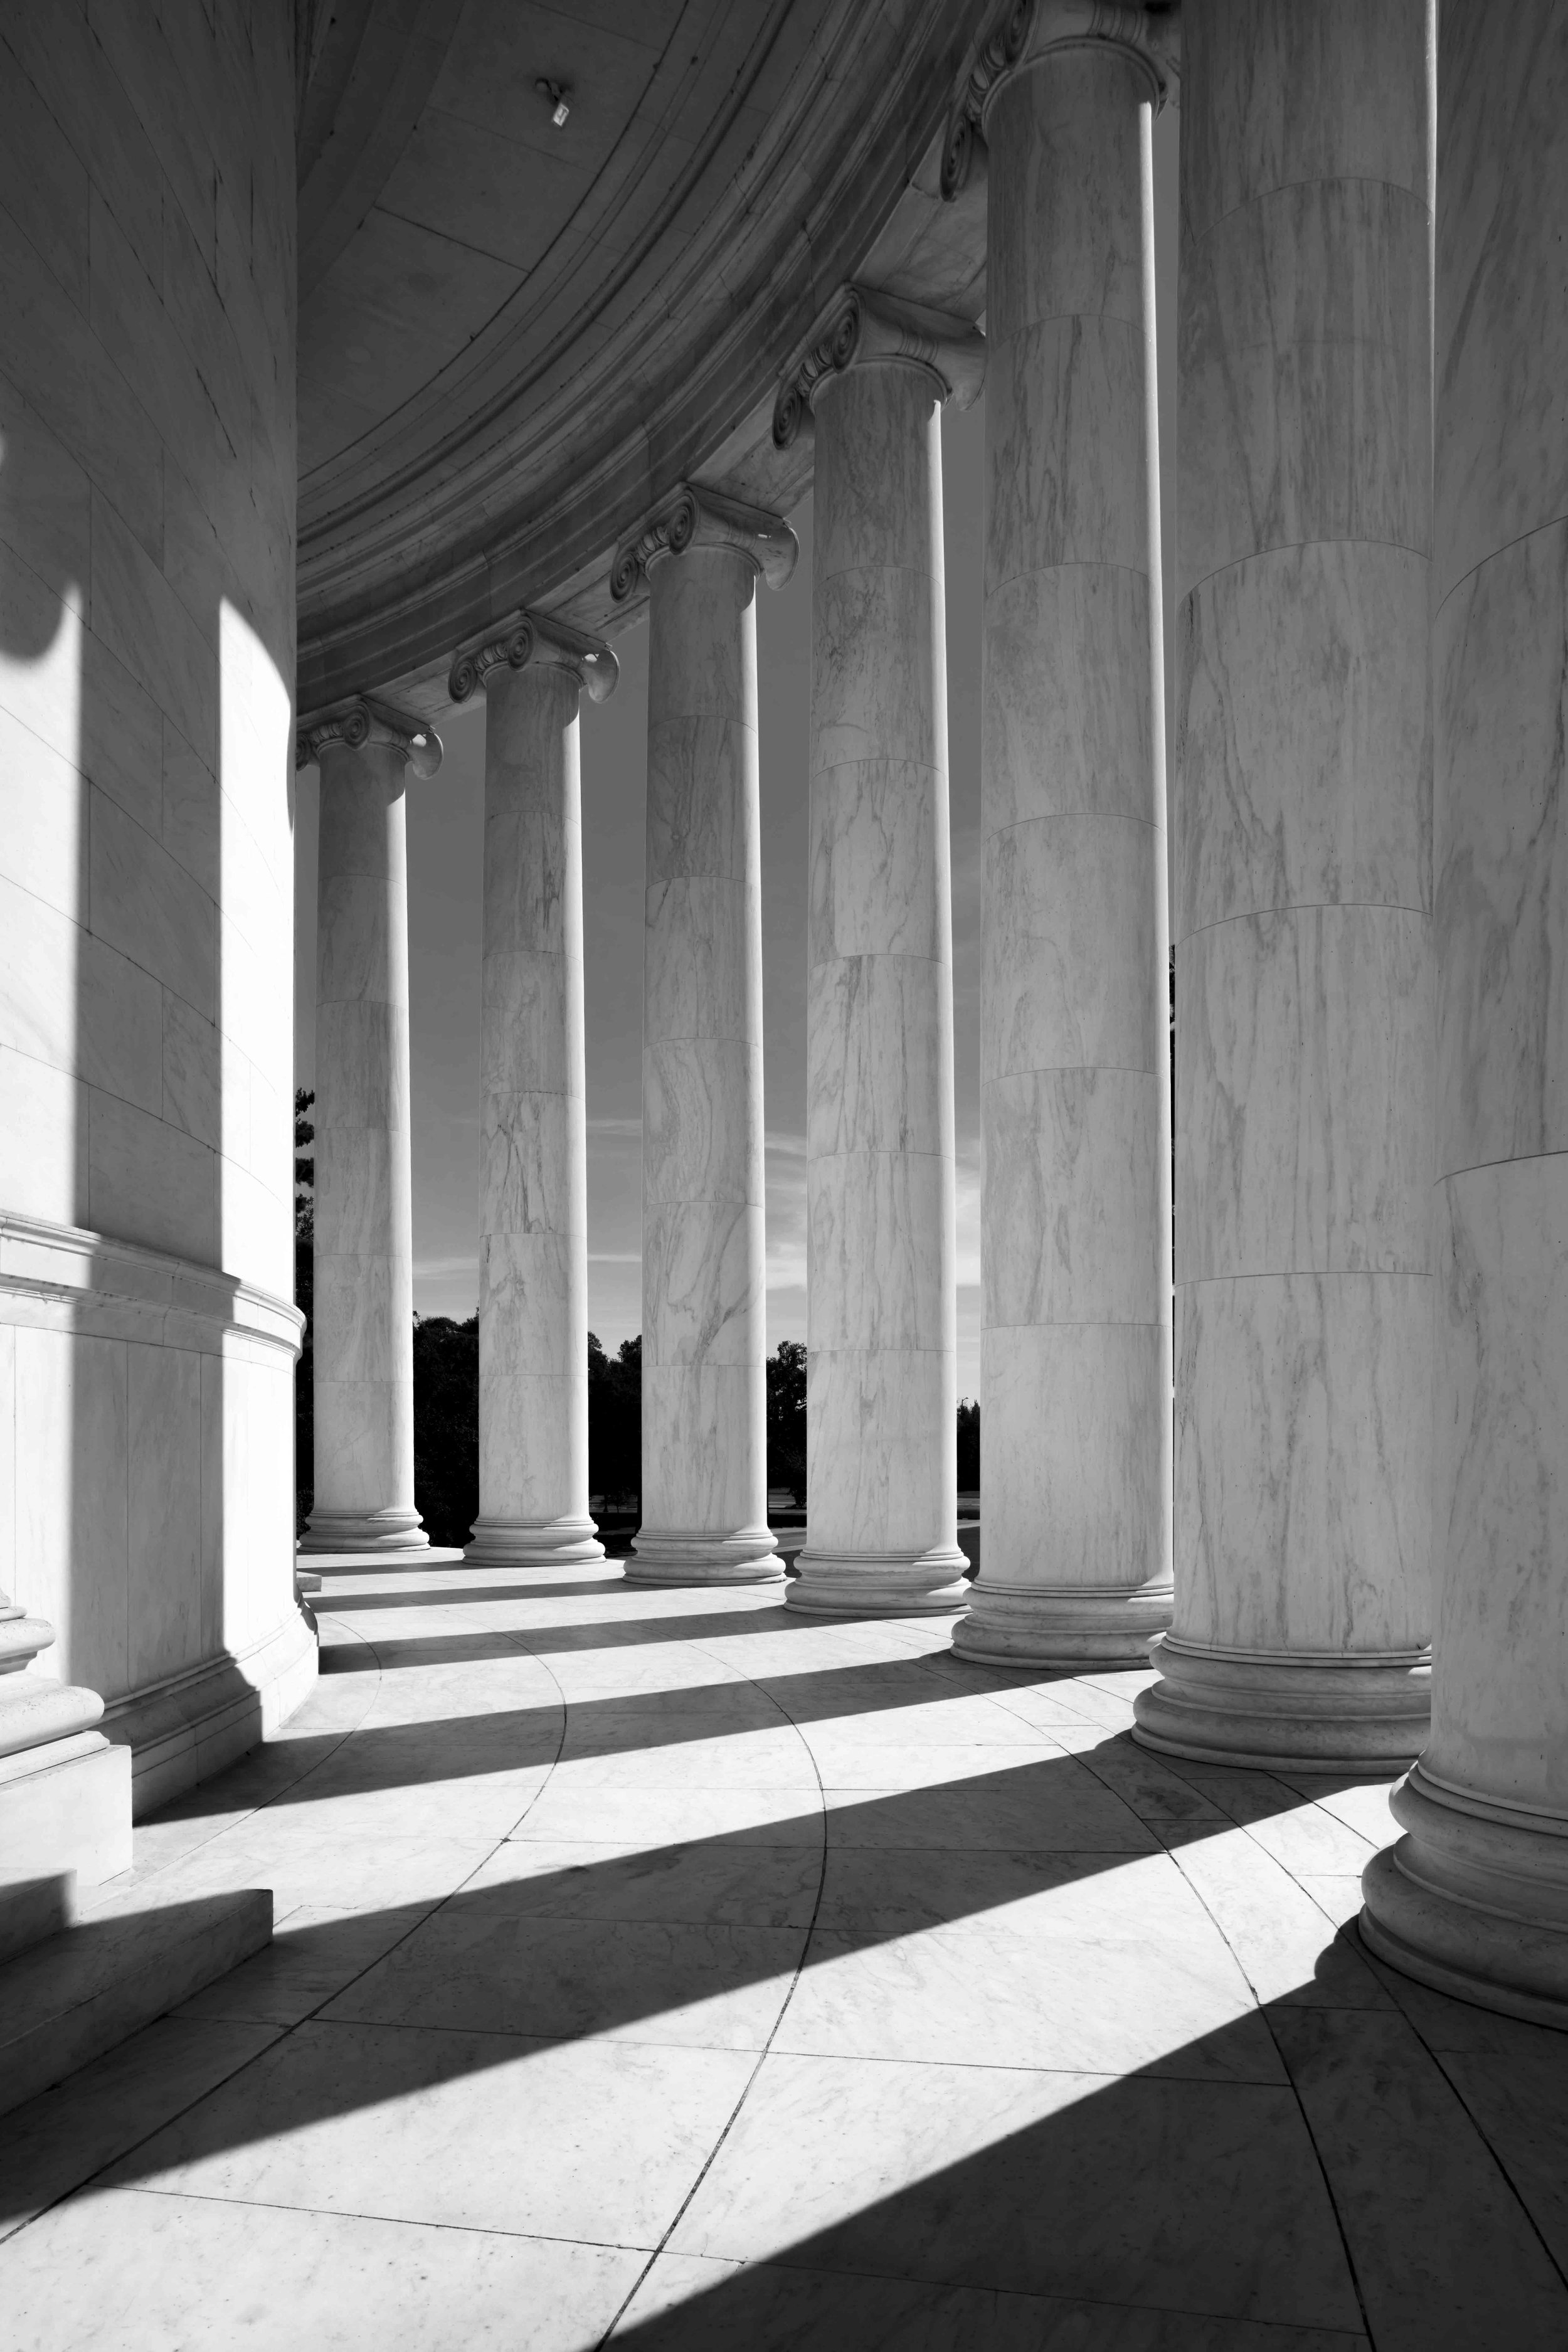 2017 10 Washington DC Architectural-9842.jpg